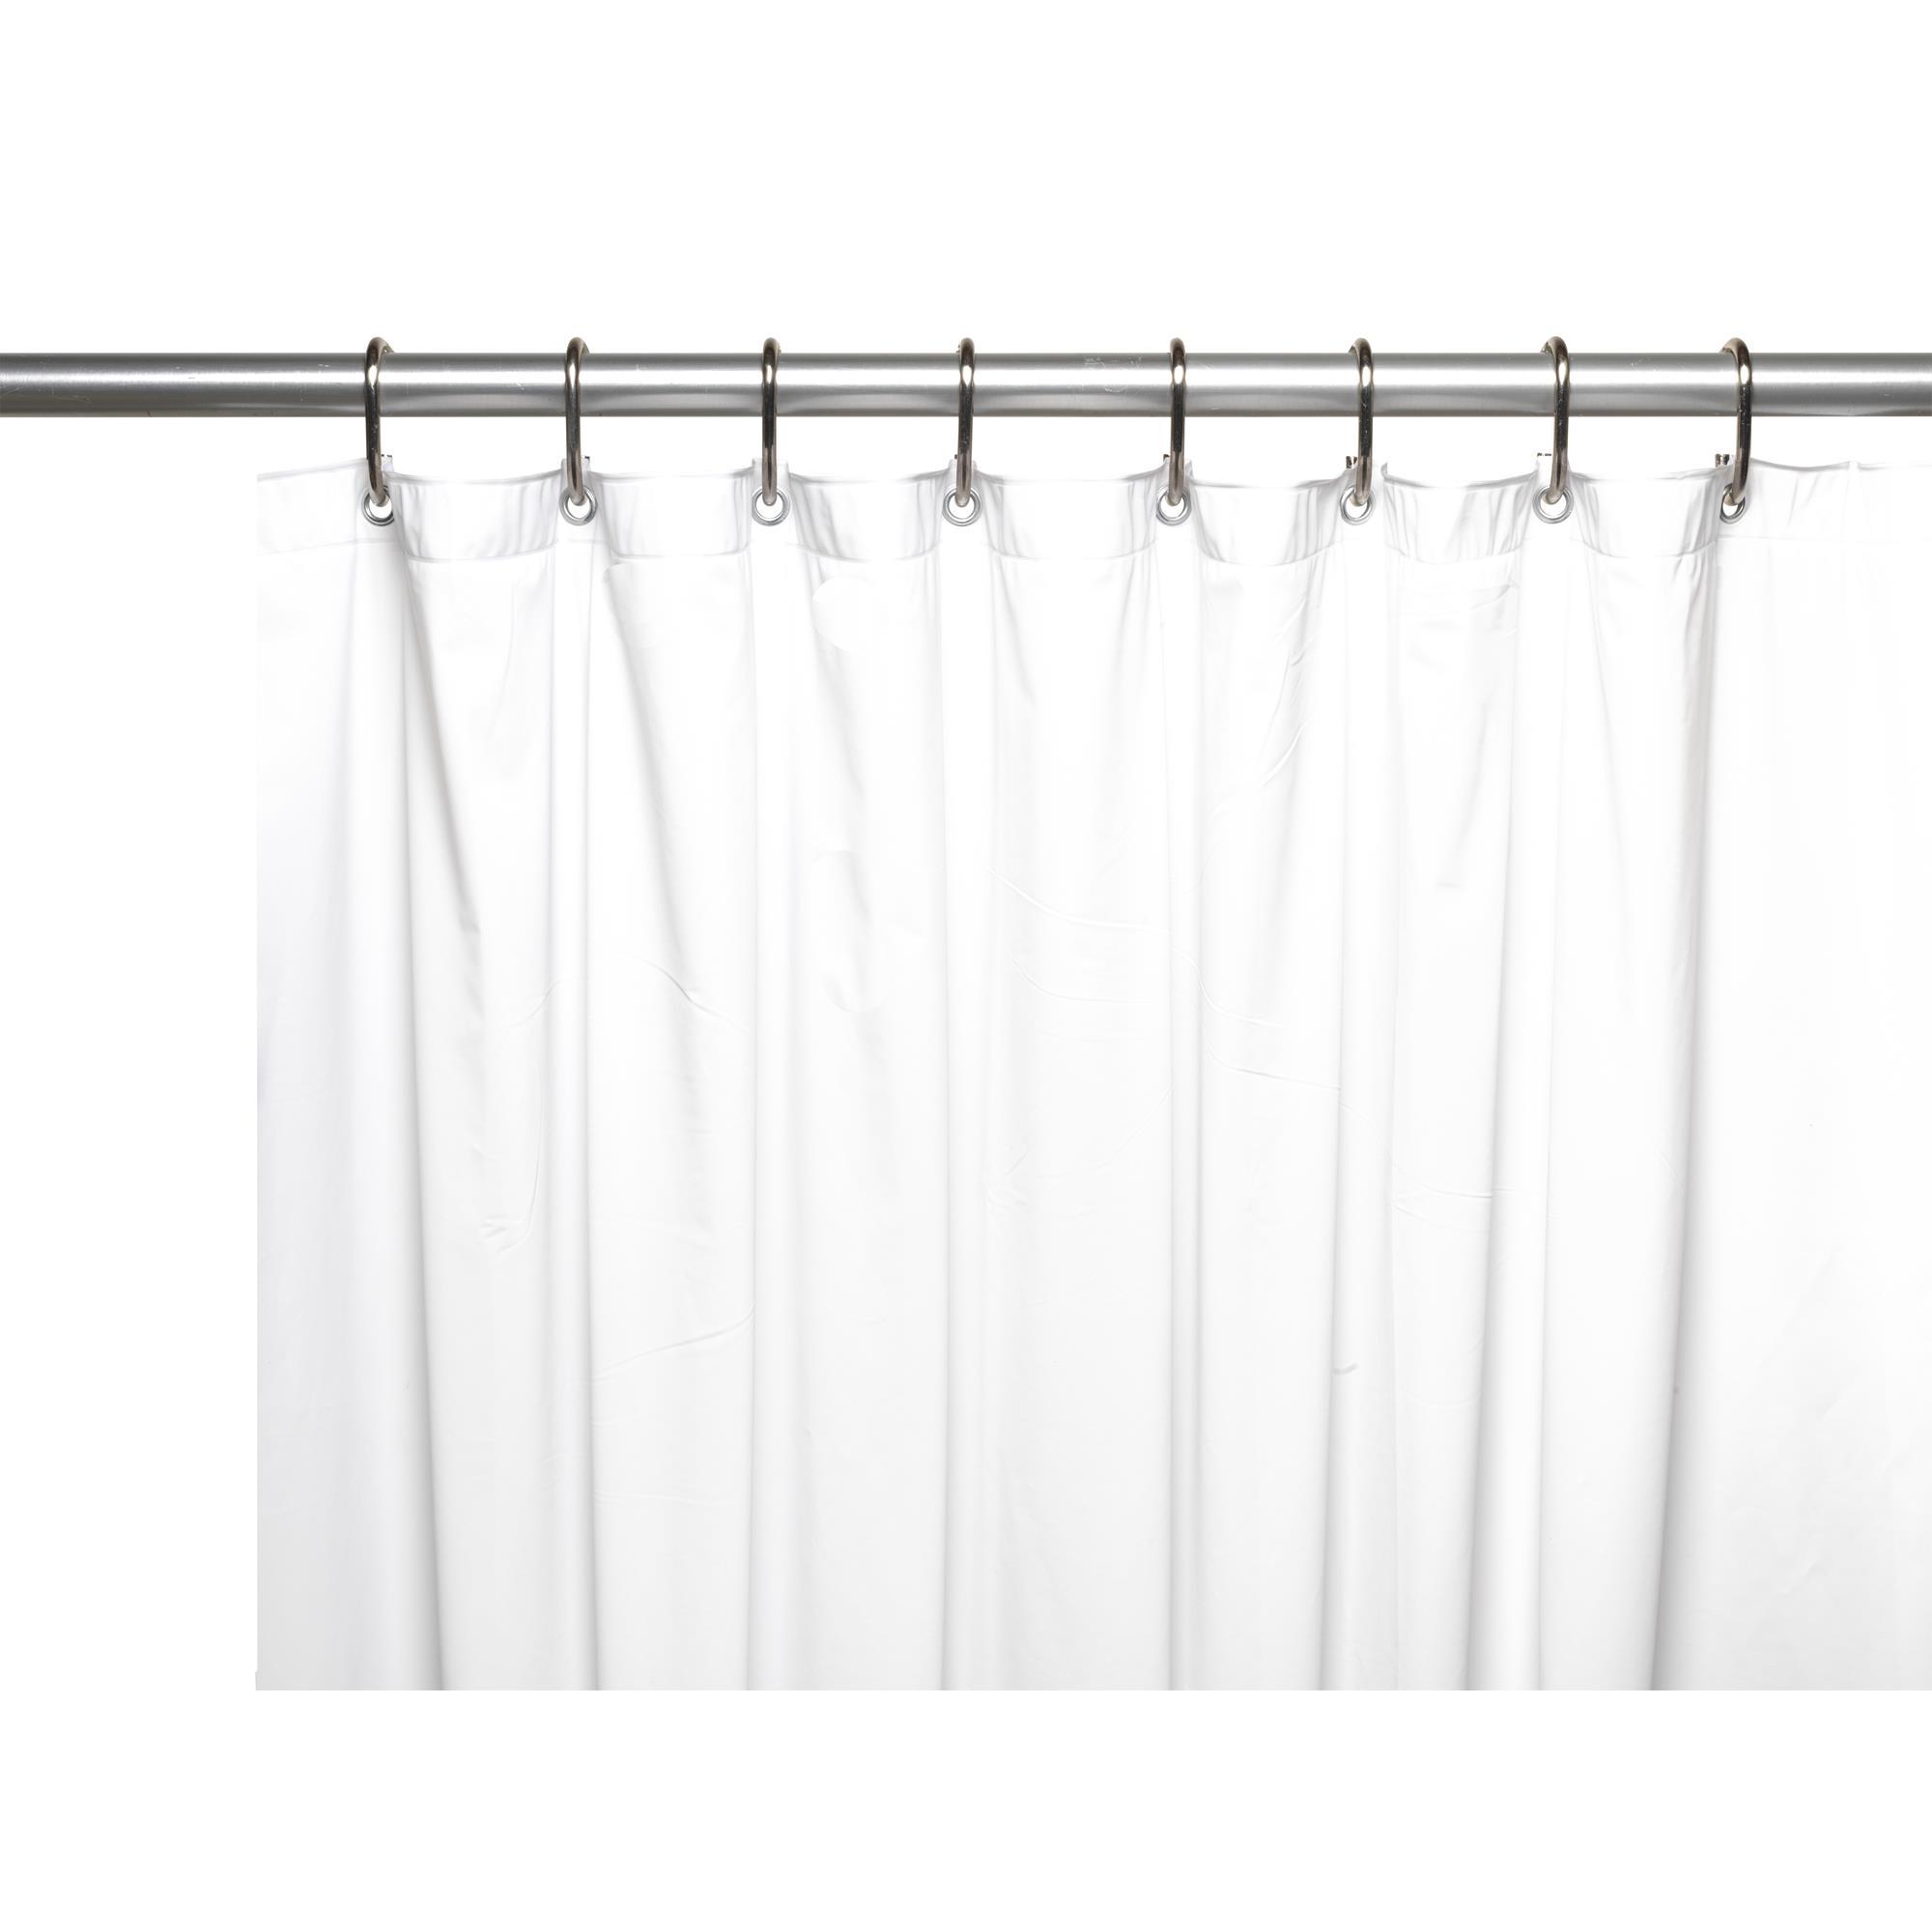 Carnation 3 Gauge Vinyl Shower Curtain Liner Weighted Grommets White